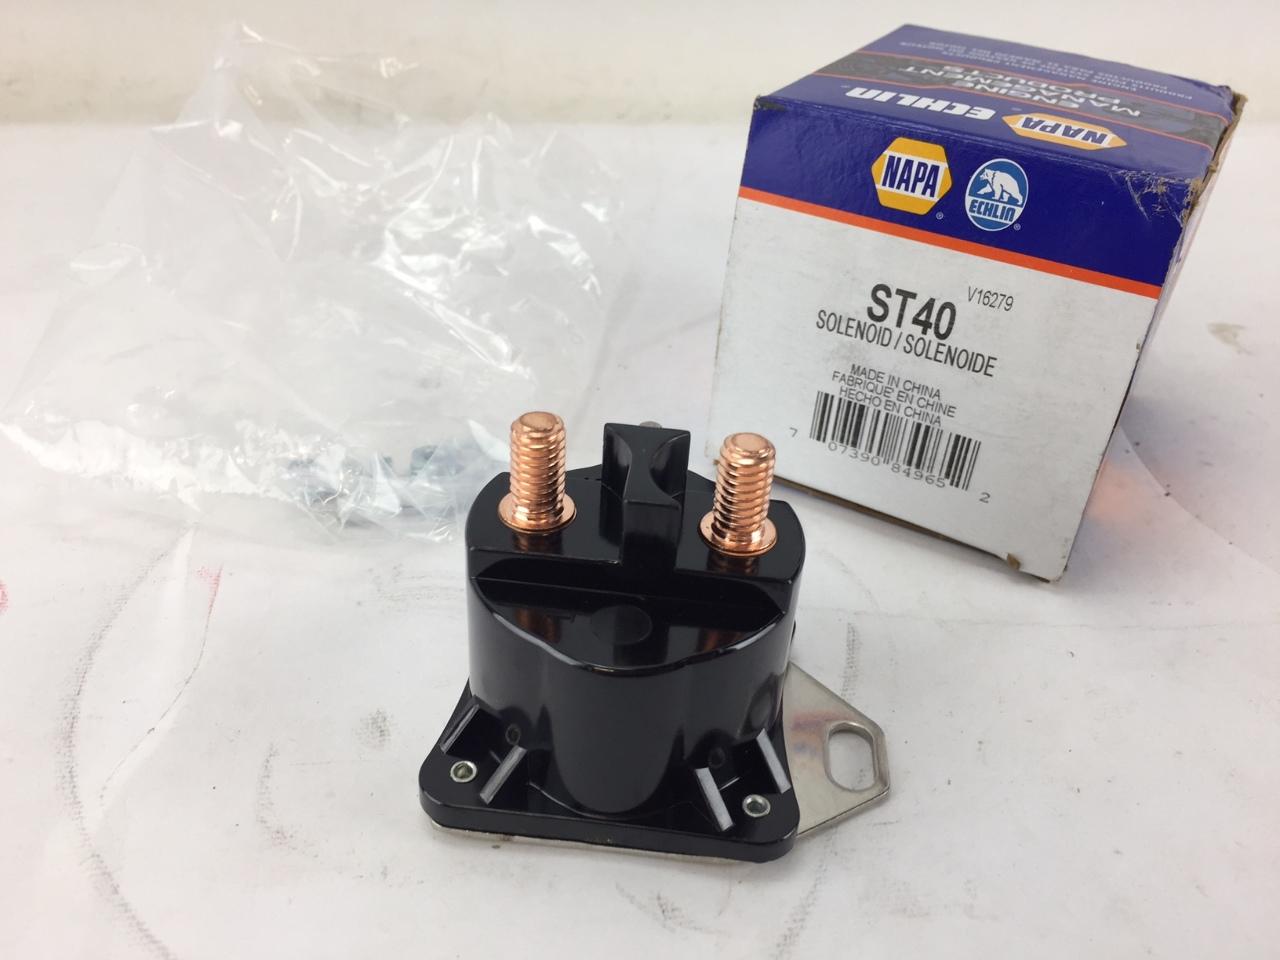 Solenoid Napa St51 Starter Switch Wiring Diagram Lotastock 1280x960